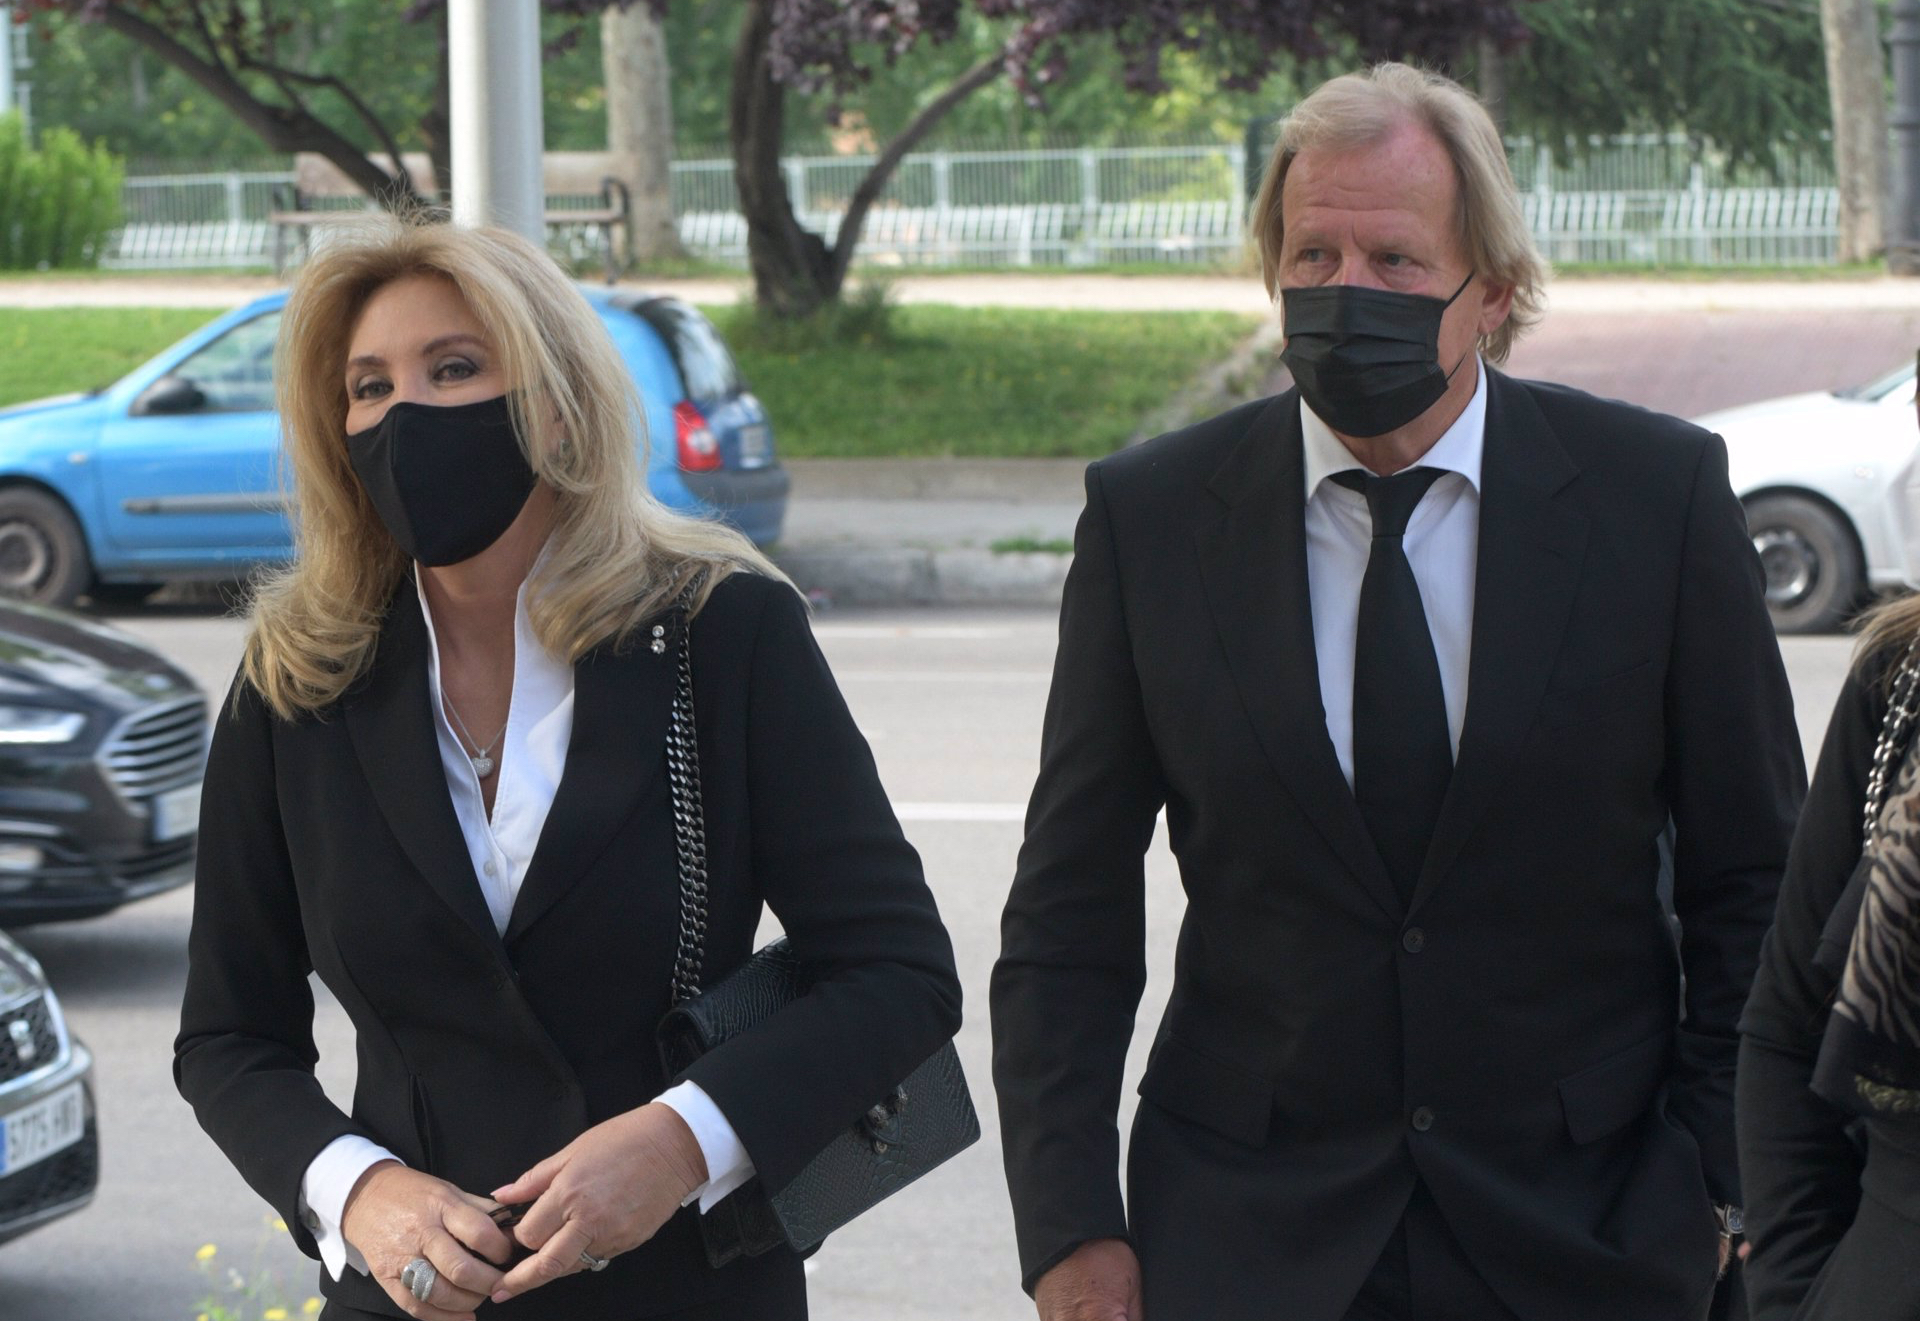 Norma Duval arriba al tanatori acompanyada del seu marit - Europa Press